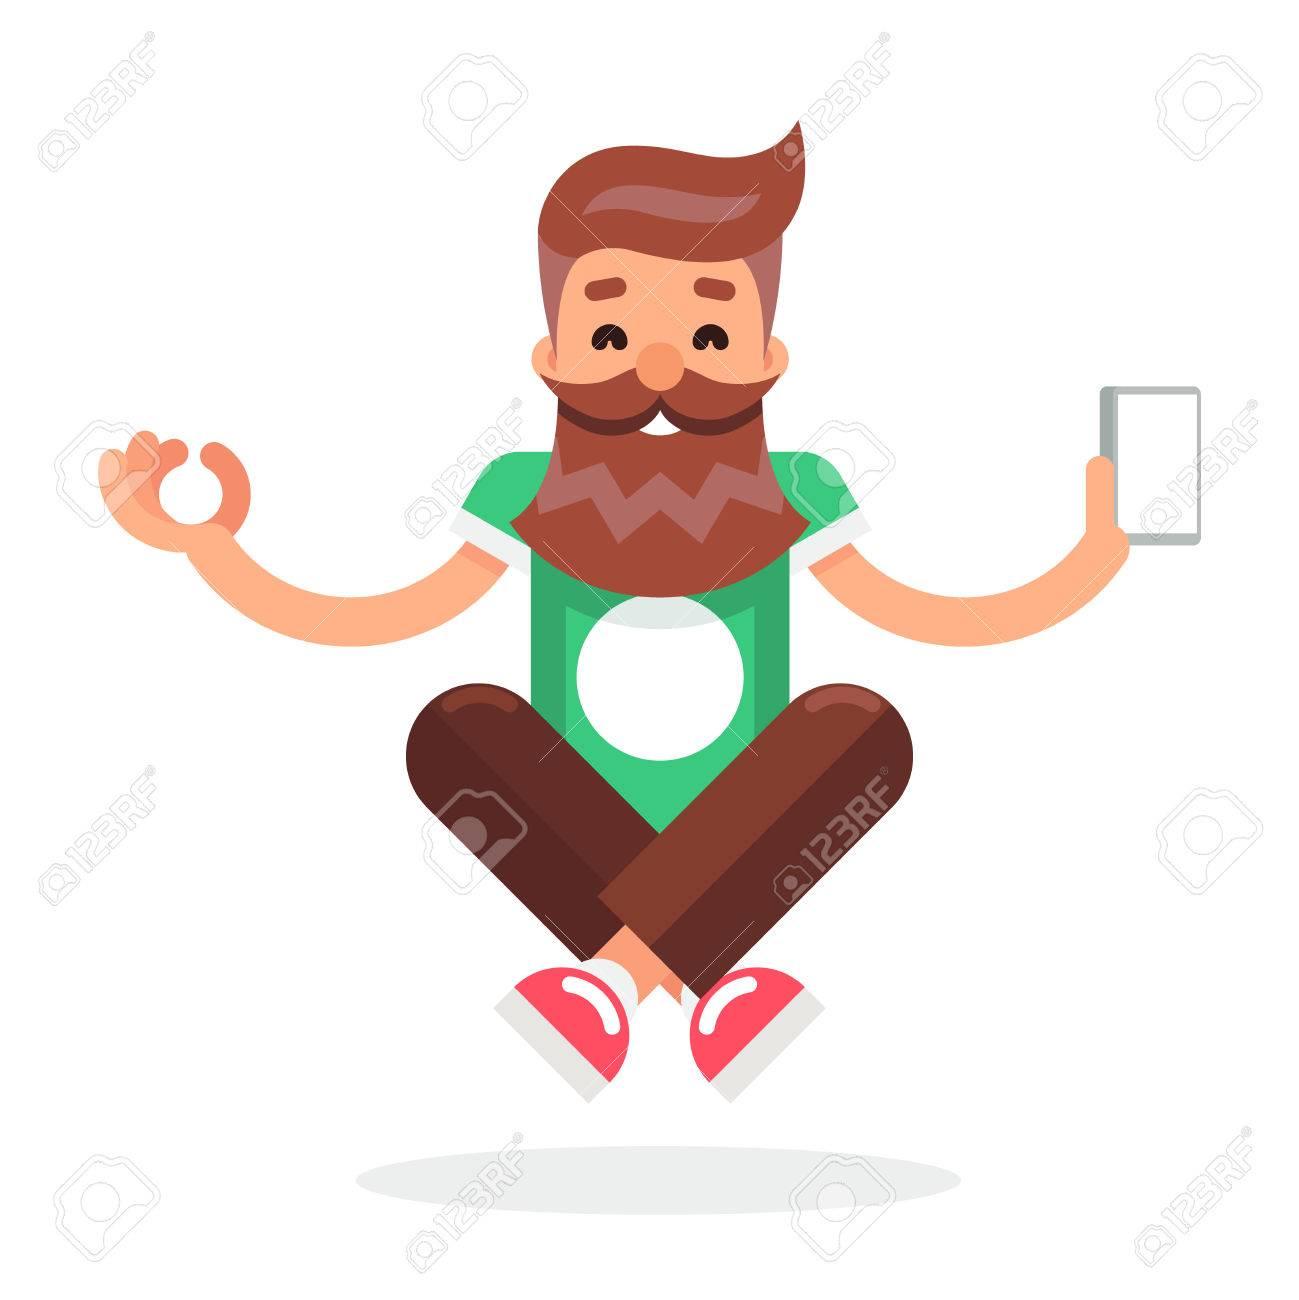 New Smartphone Mobile Technology Enlightenment Hipster Geek Cartoon Symbol Flat Design Template Vector Illustration - 61098190